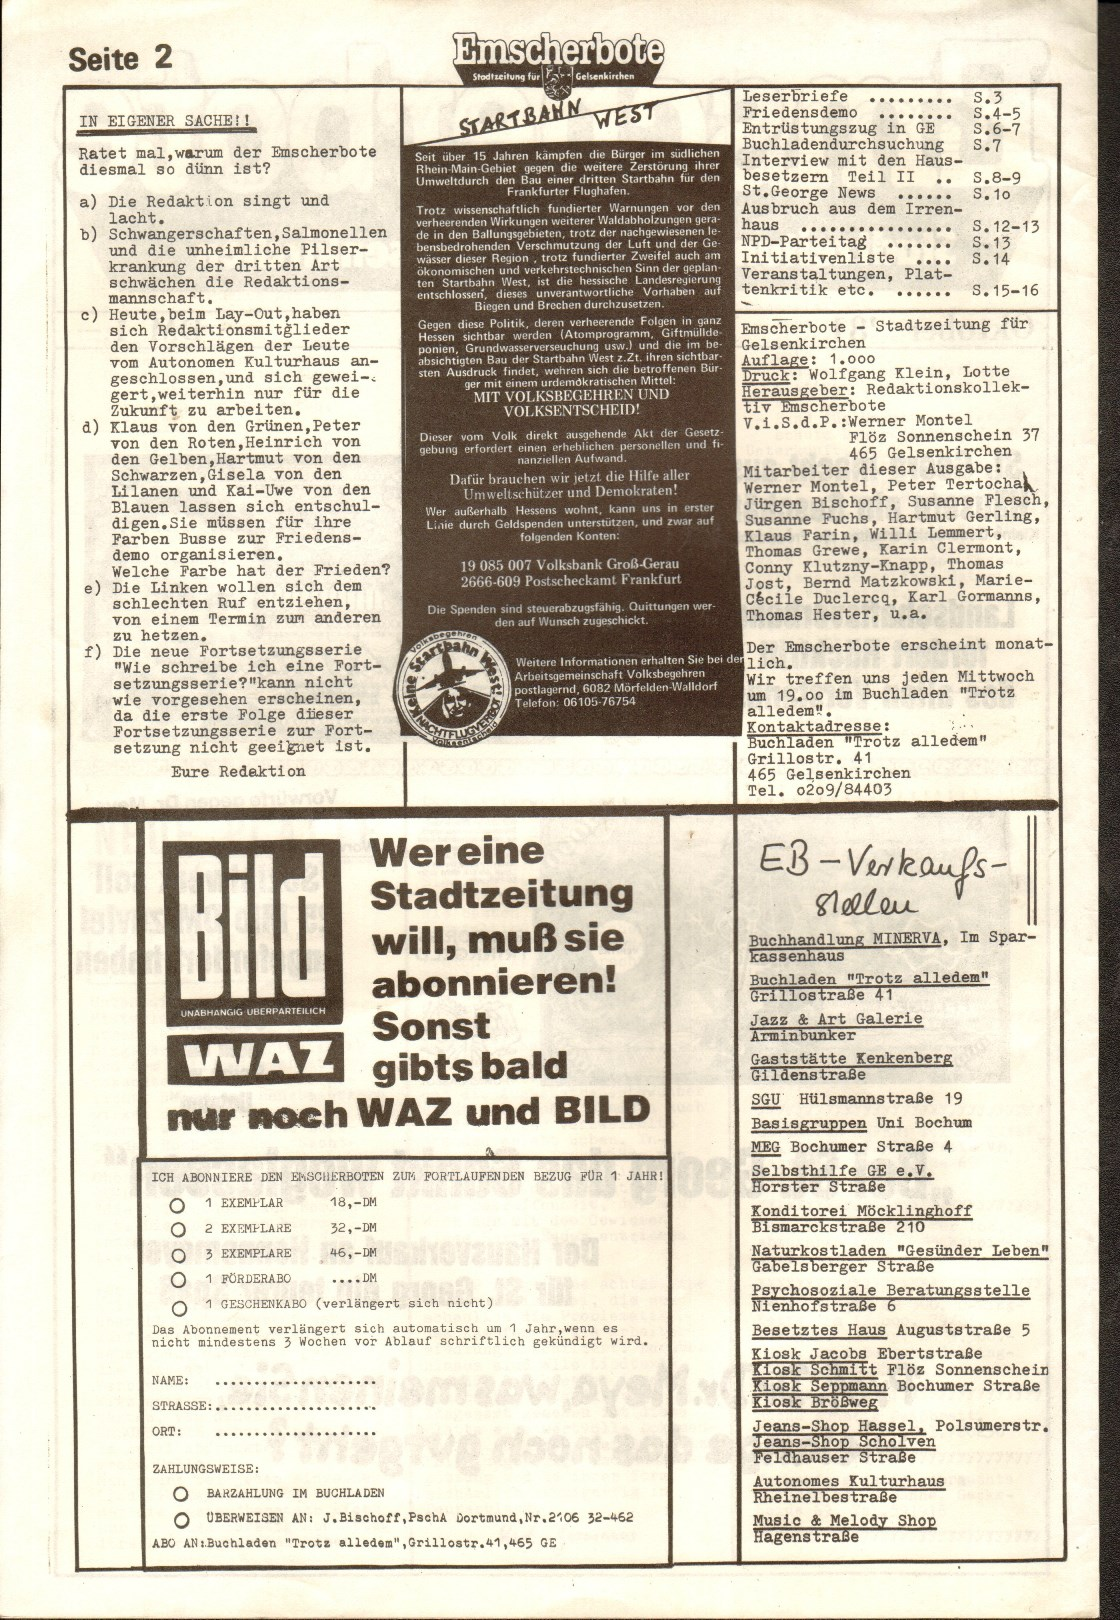 Gelsenkirchen_Emscherbote_1981_11_02